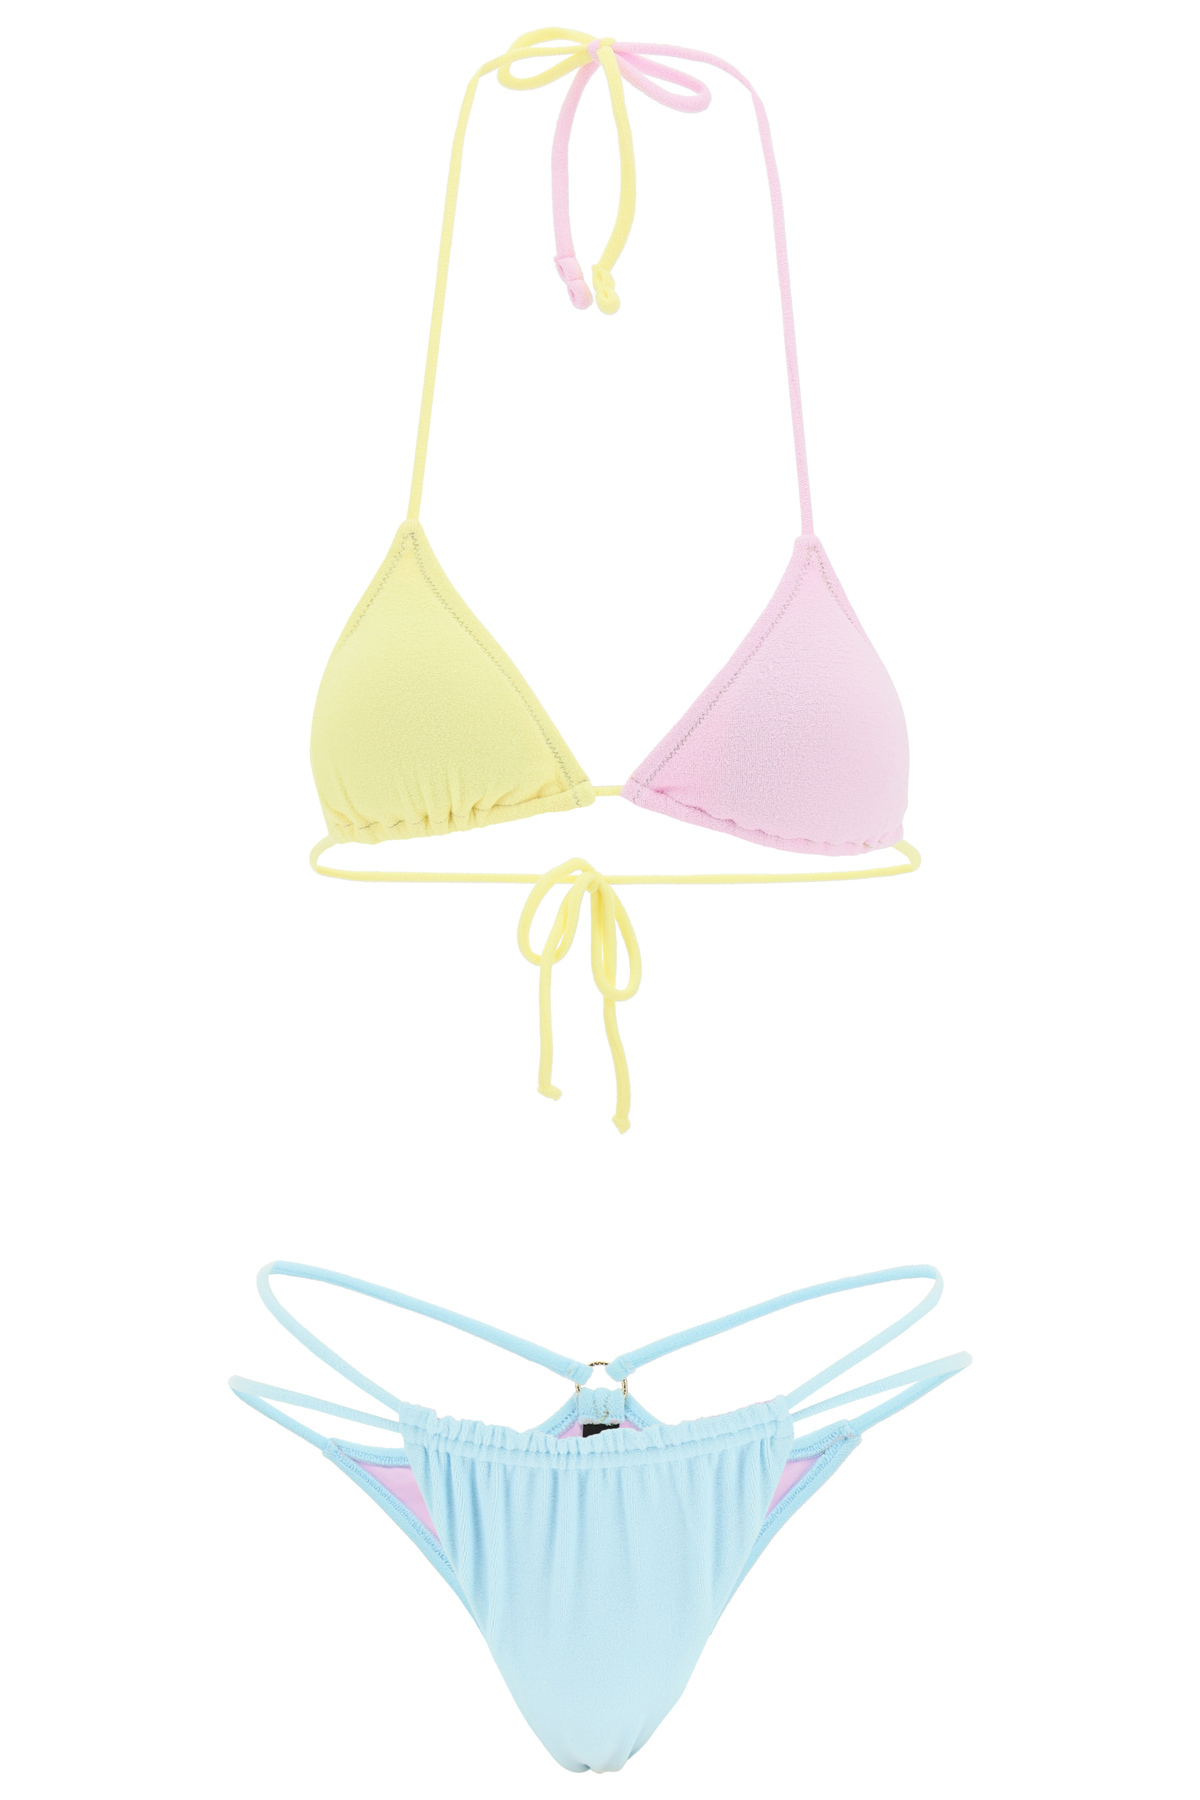 Reina olga maja bikini set